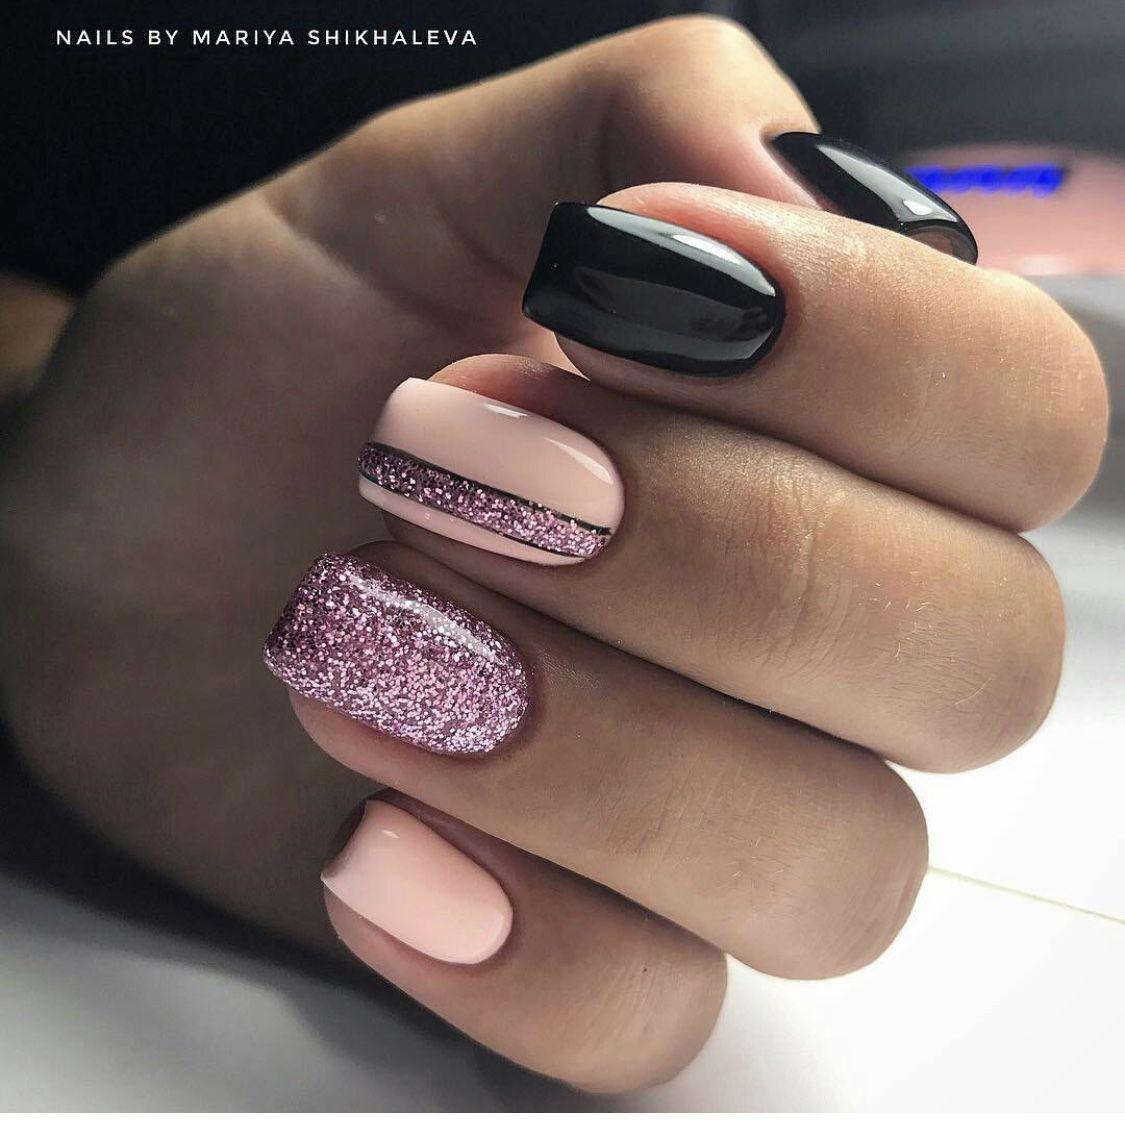 Дизайн ногтей 2020 2021 фото новинки